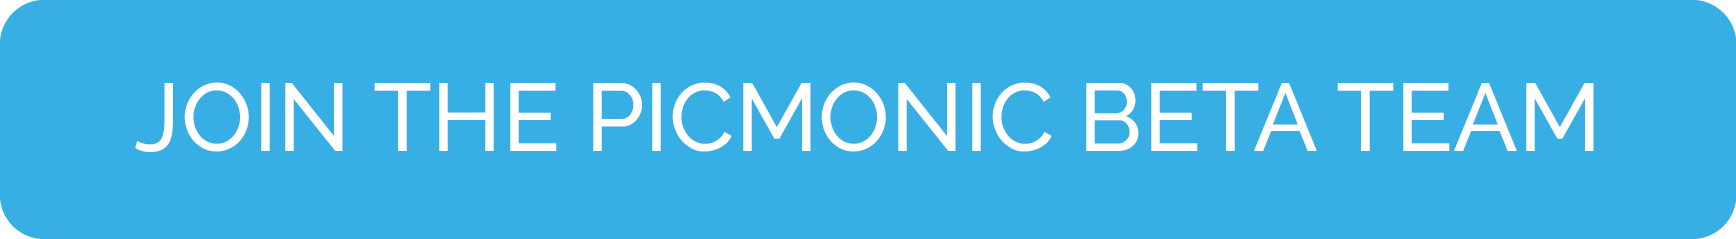 Join the Picmonic Beta Team CTA